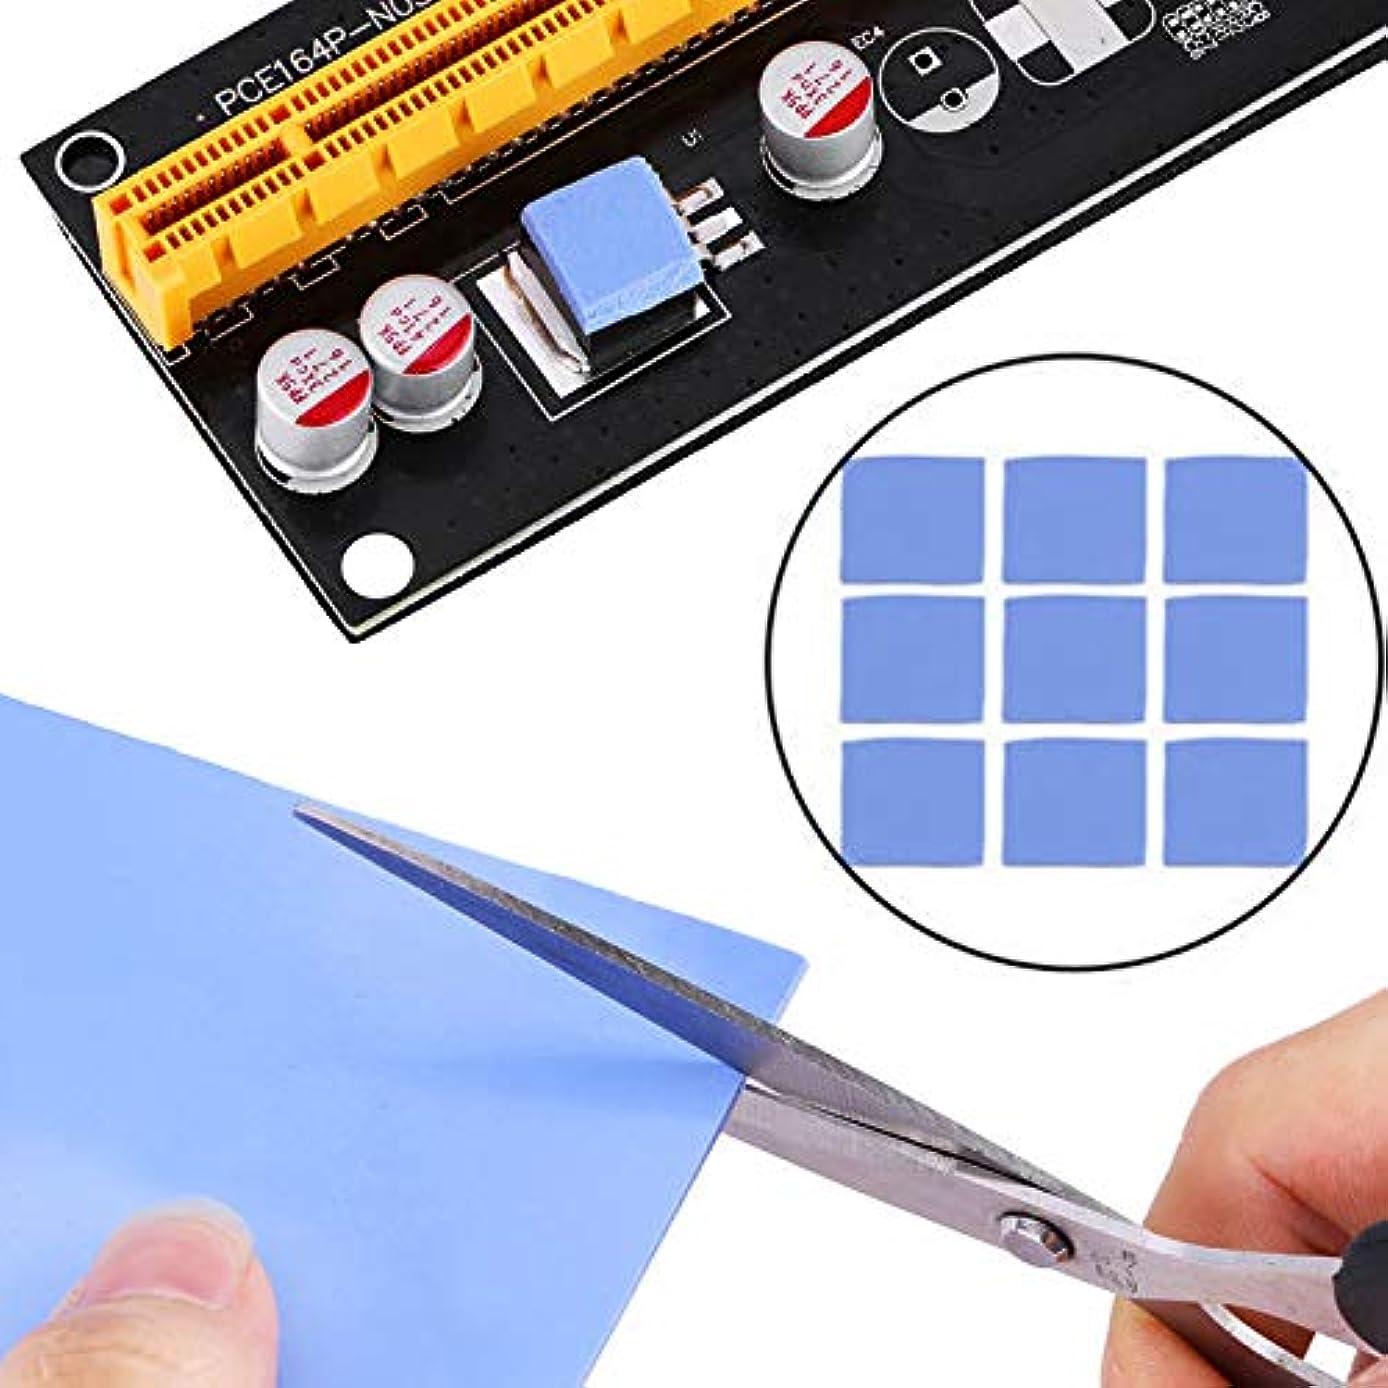 Shenlian Heatsink Cooling Silicone Pad 1001002mm CPU Thermal Pad CPU Cooler Universal CPU Heatsink Pad Gpu Heatsink Pad Electronic Device